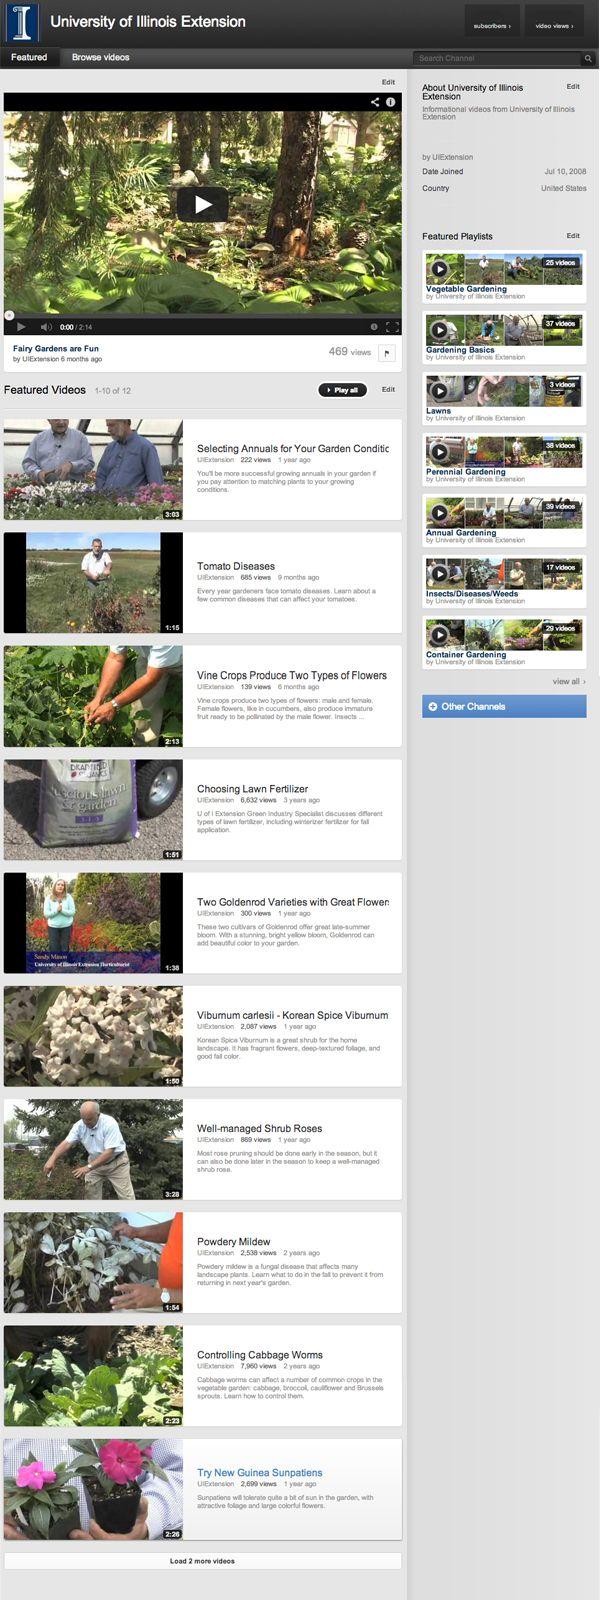 7d103e823f3860571579ac62e29e6e9c - University Of Illinois Extension Master Gardener Program